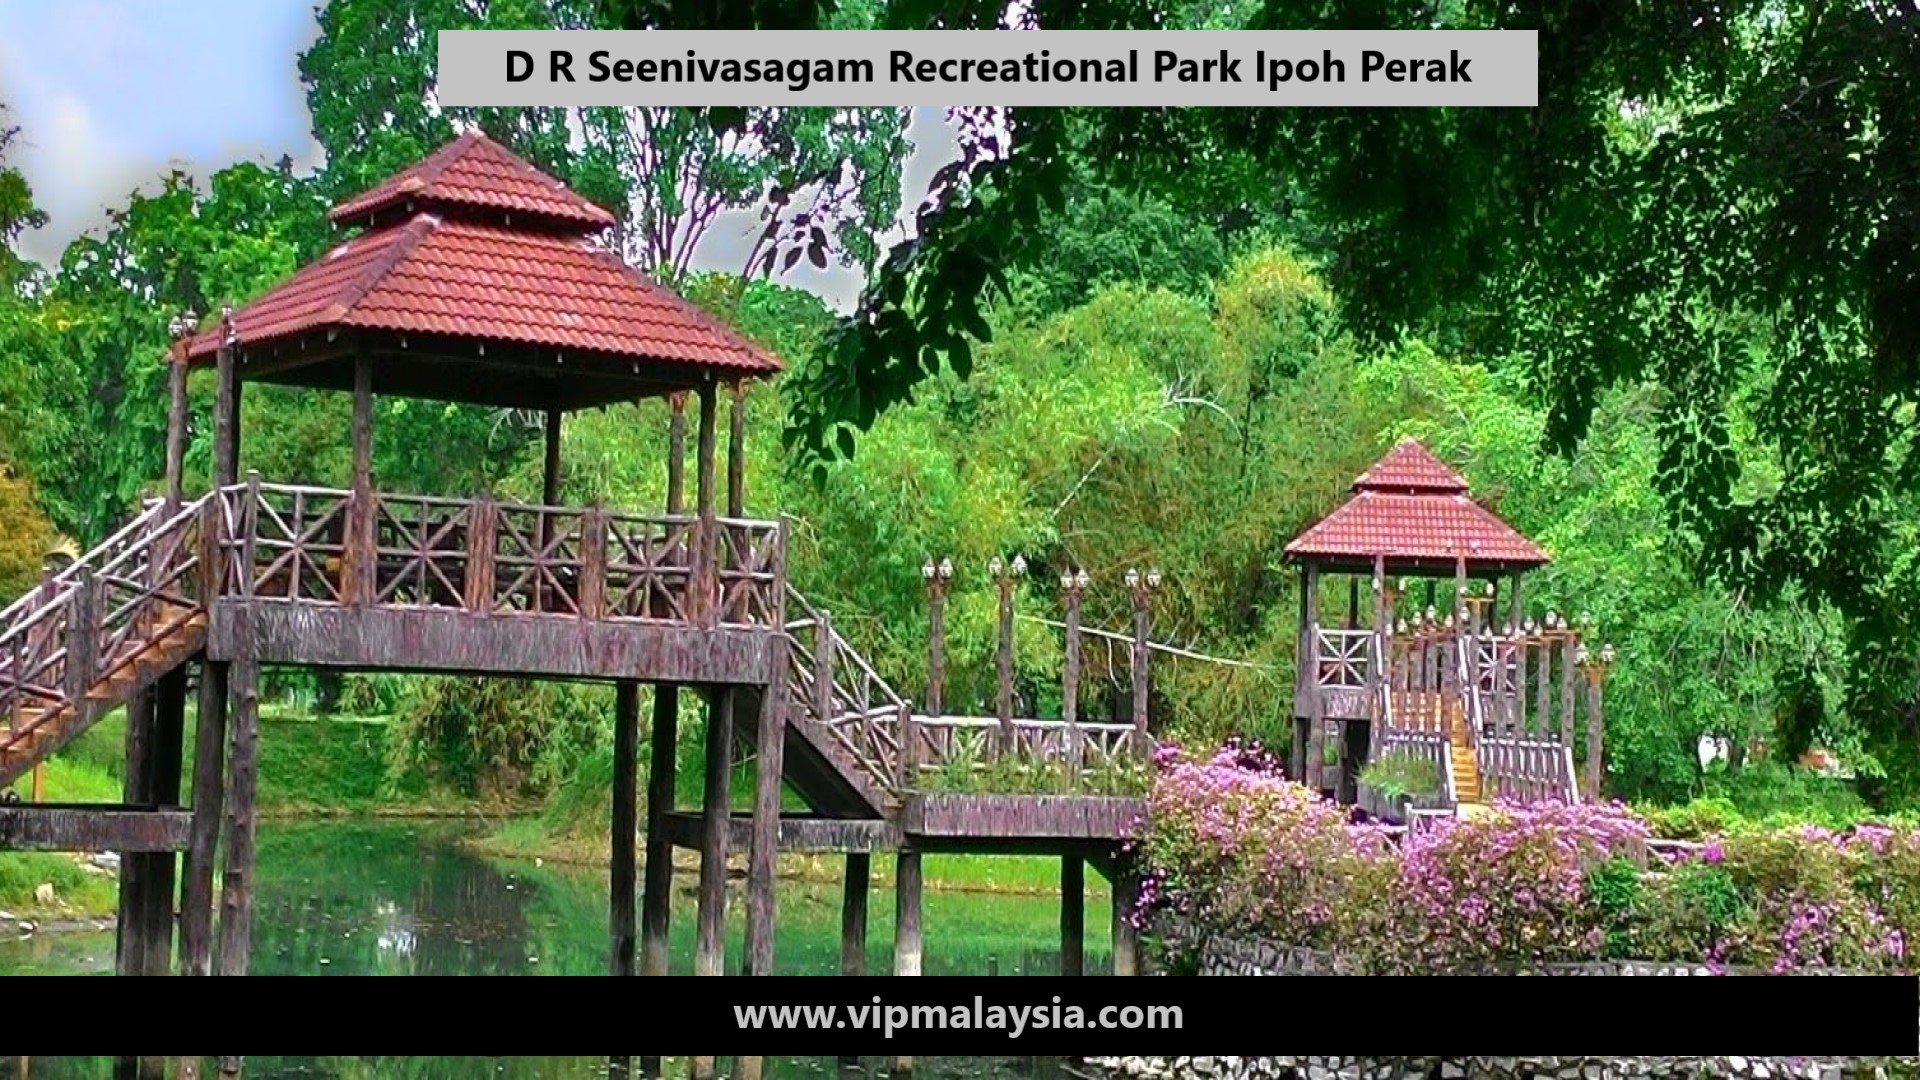 D R Seenivasagam Recreational Park Ipoh Perak Malaysia